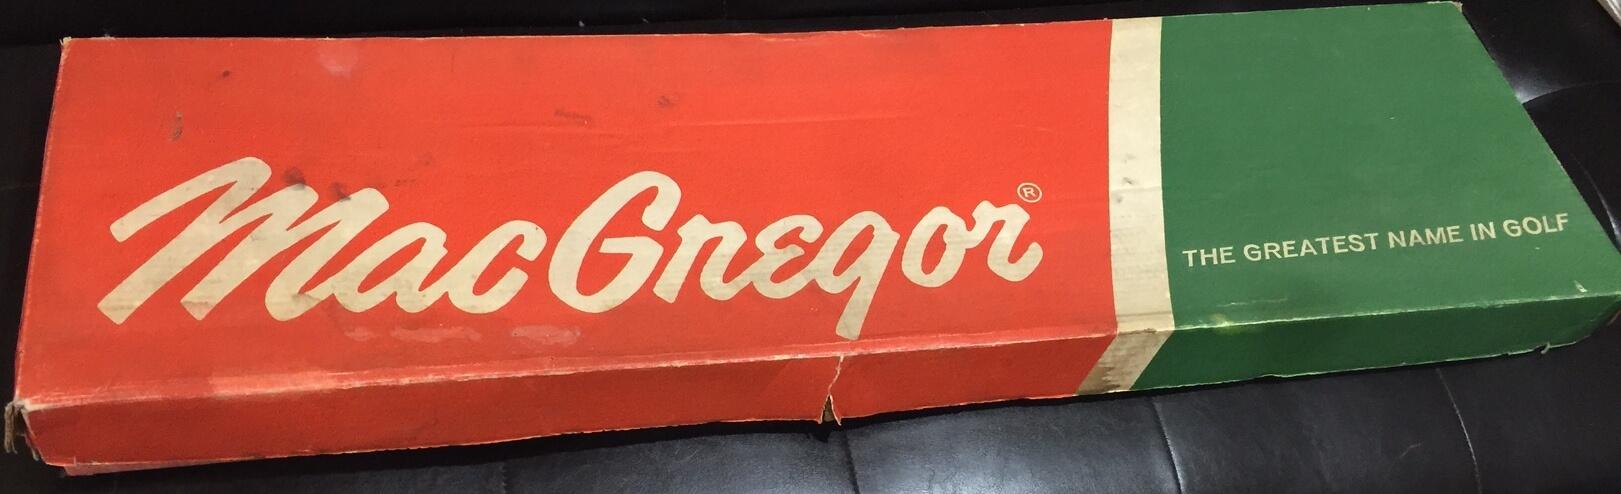 1970's MacGregor Vintage Set of Golf Club Irons,Nicklaus Series 80, in Original Box